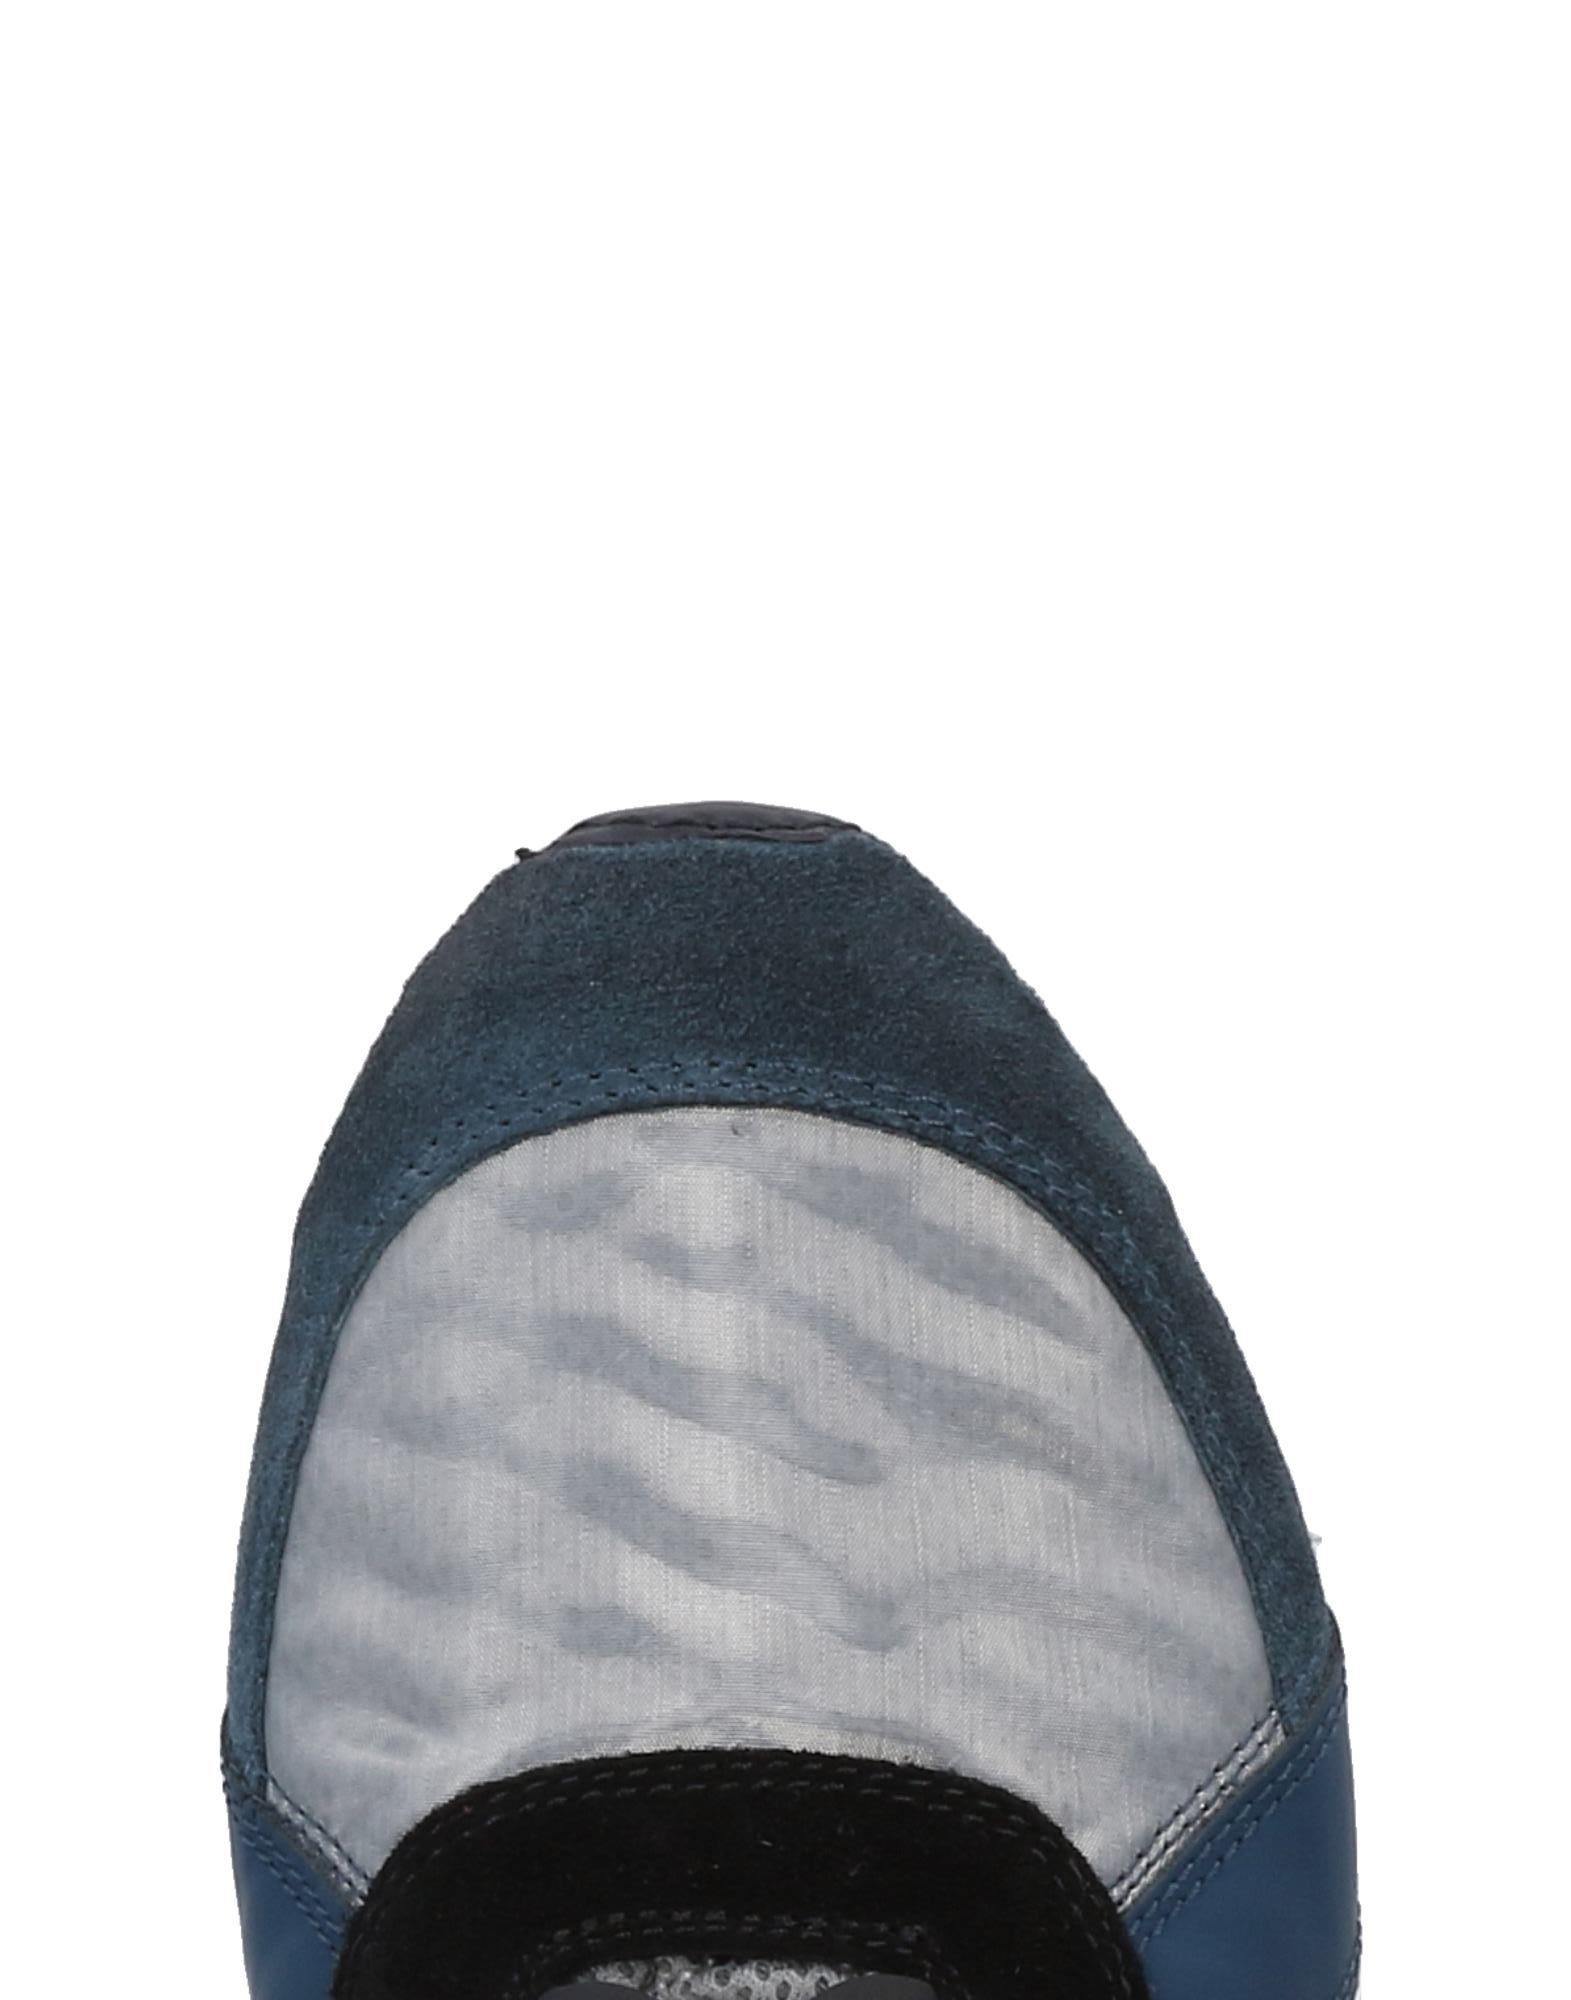 Moda Sneakers O.X.S. O.X.S. O.X.S. Donna - 11454639DU 968adc